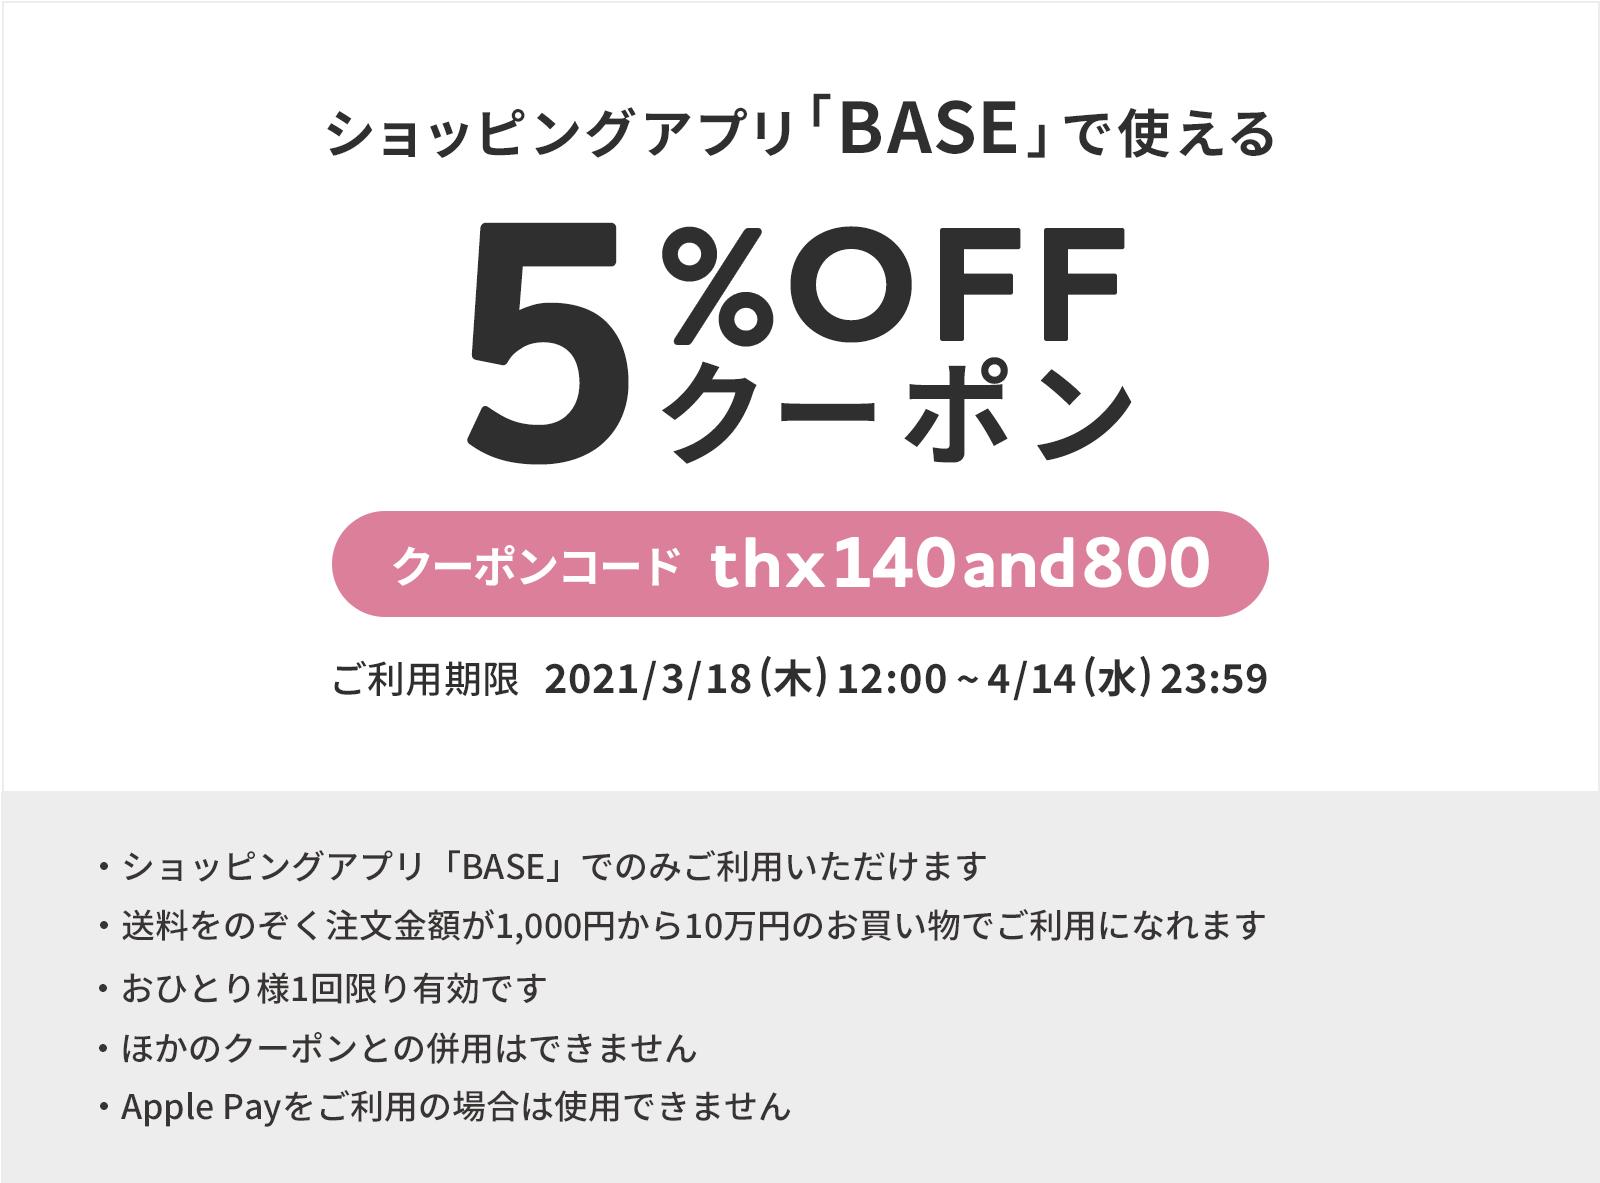 【5%OFFクーポン】デコルテケア商品がさらにお得に【送料無料】